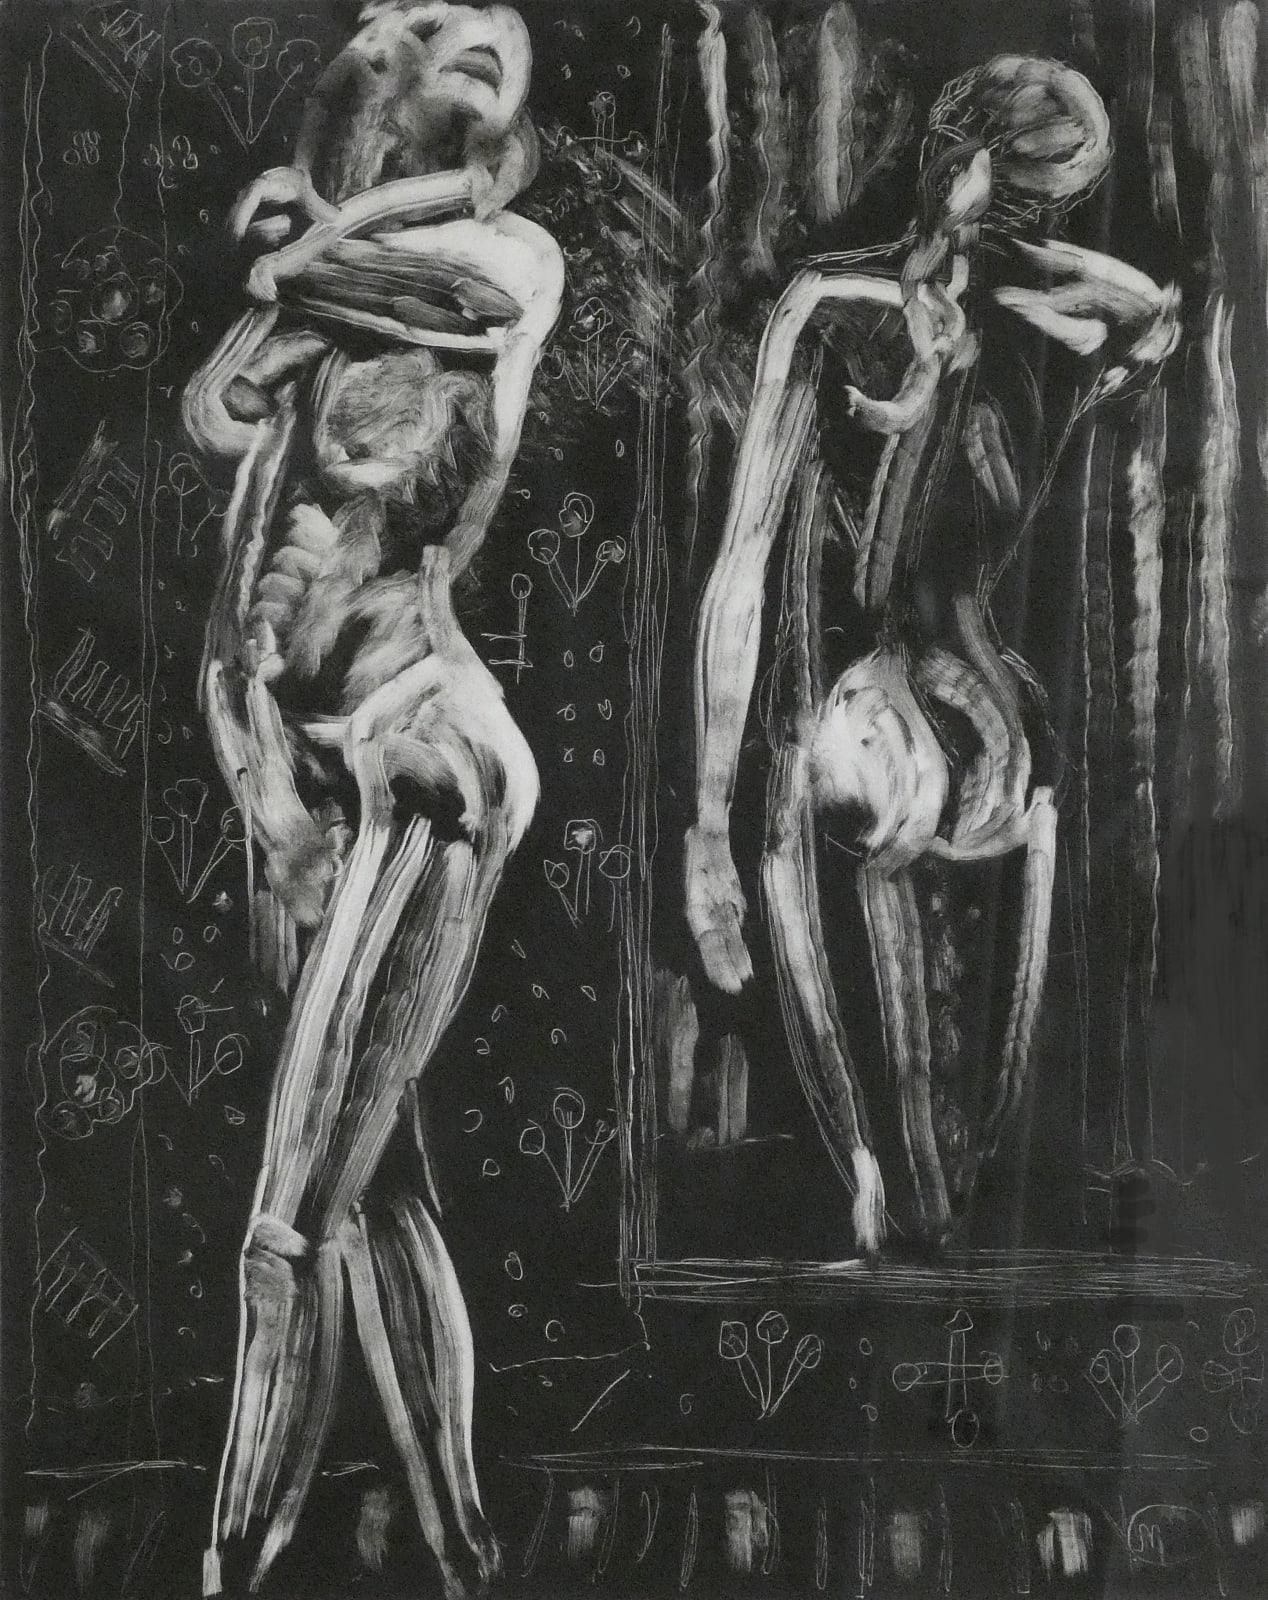 Leonard Mccomb, Standing nude with mirror, 2010